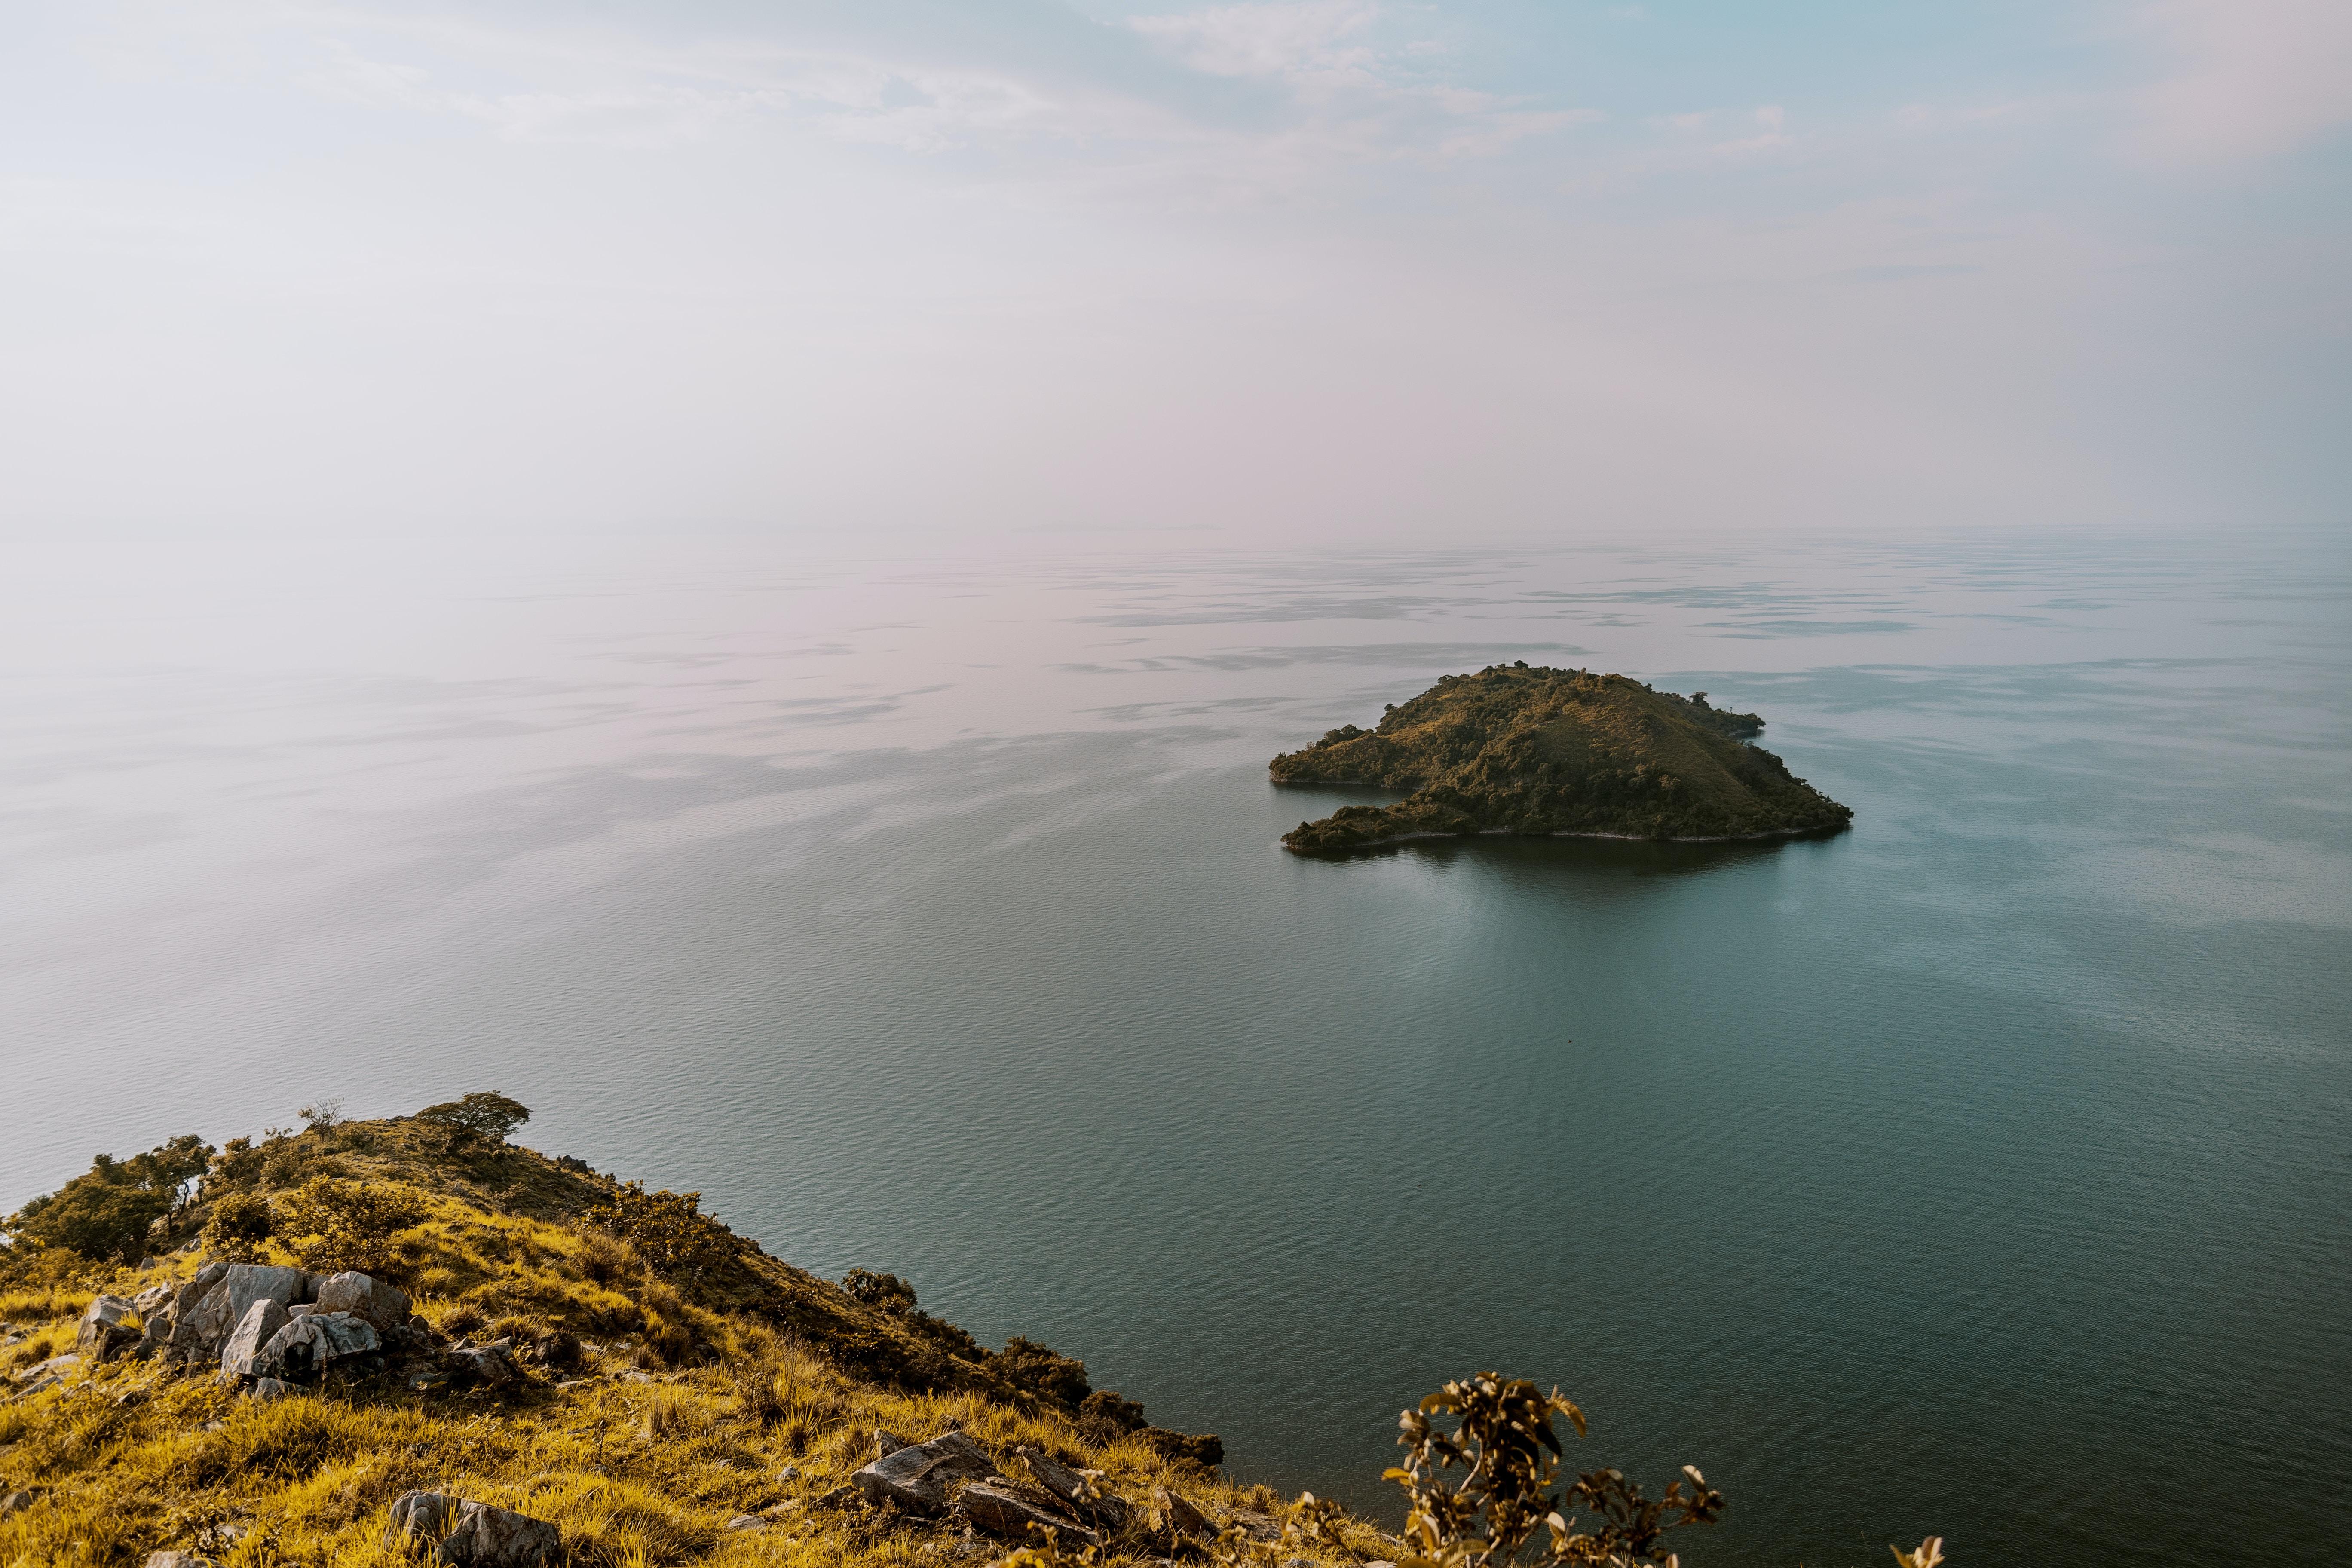 photo of brown island